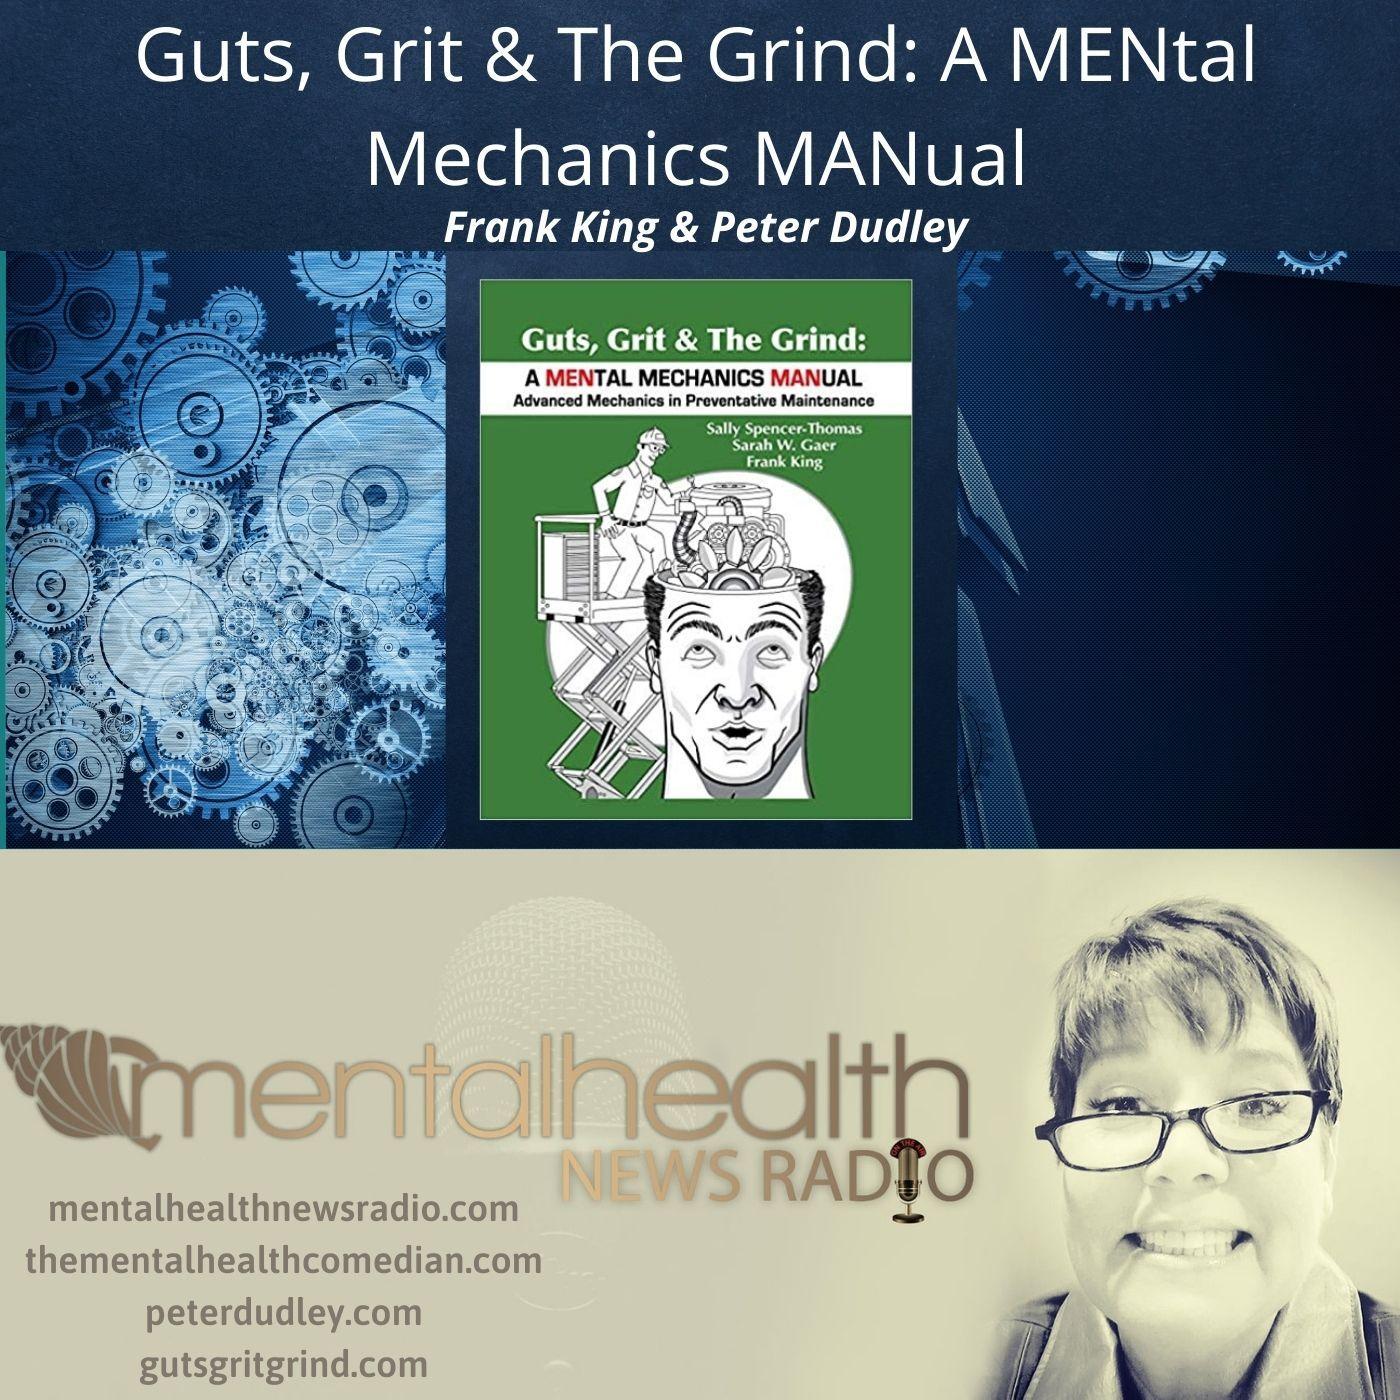 Mental Health News Radio - Guts, Grit & The Grind: A MENtal Mechanics MANual